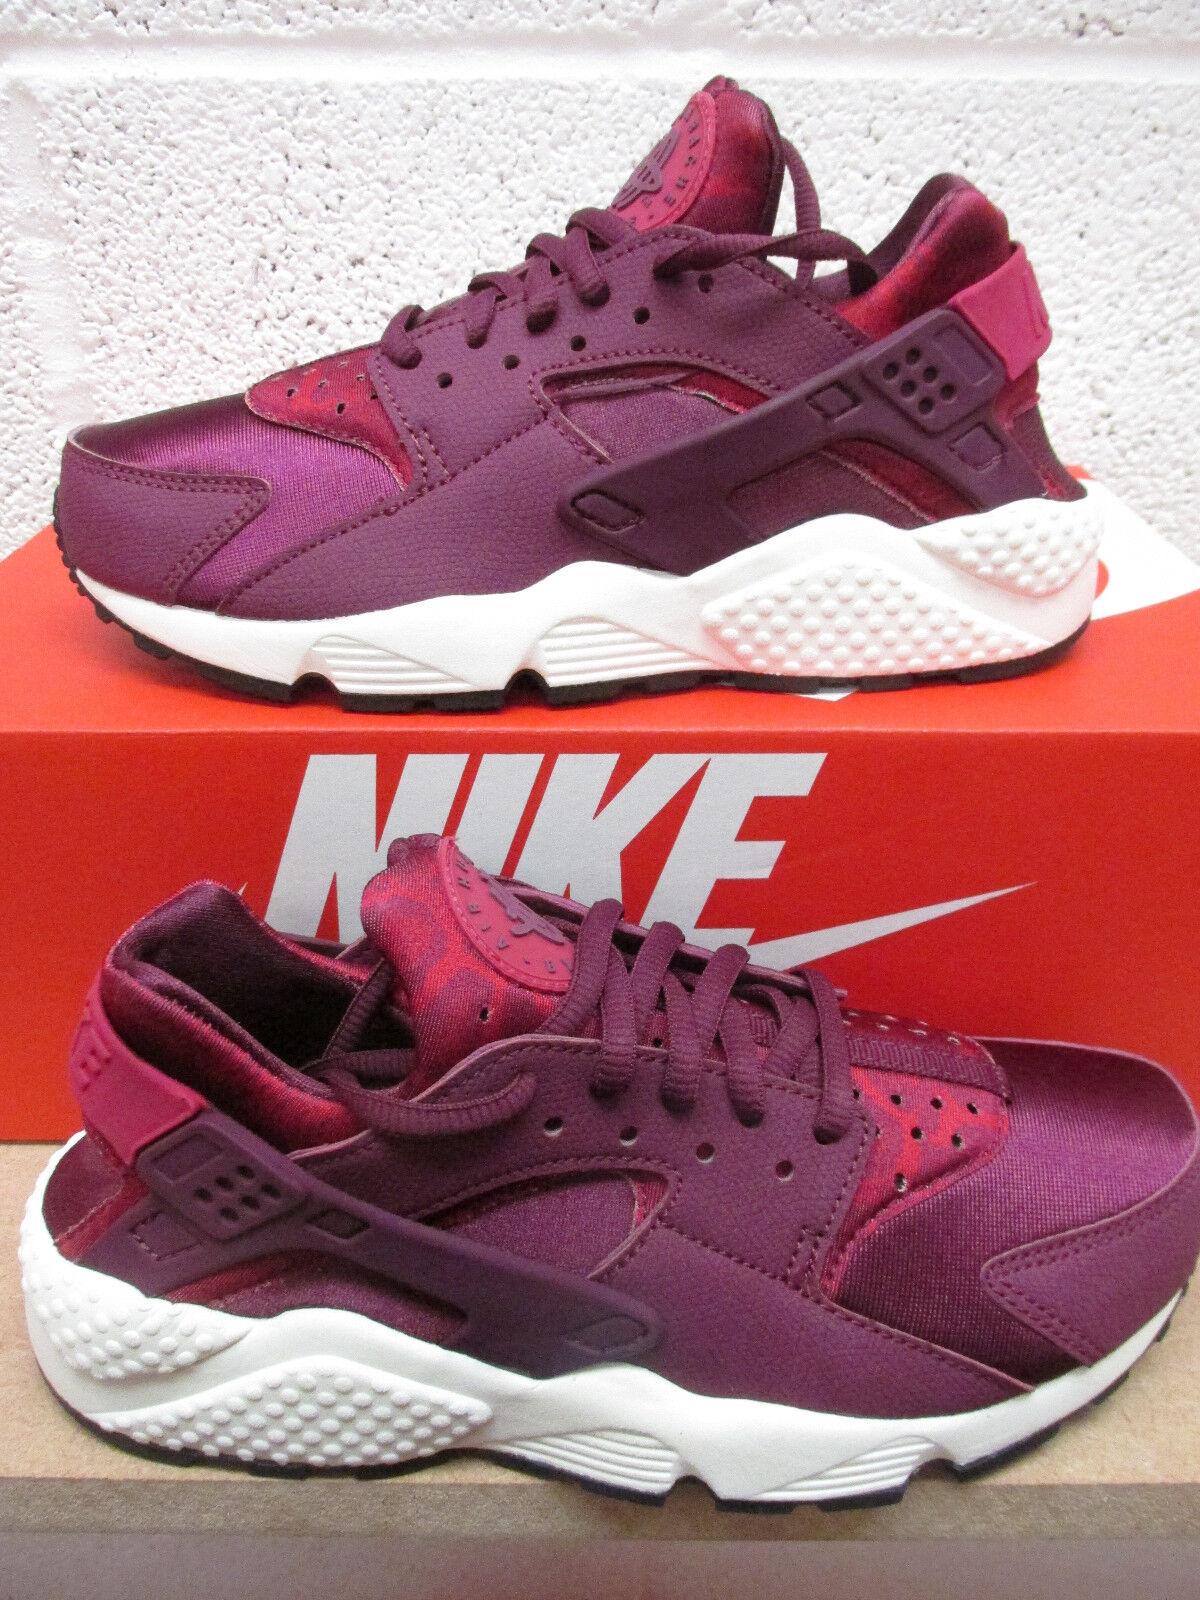 nike womens air huarache run print running trainers 725076 500 sneakers shoes